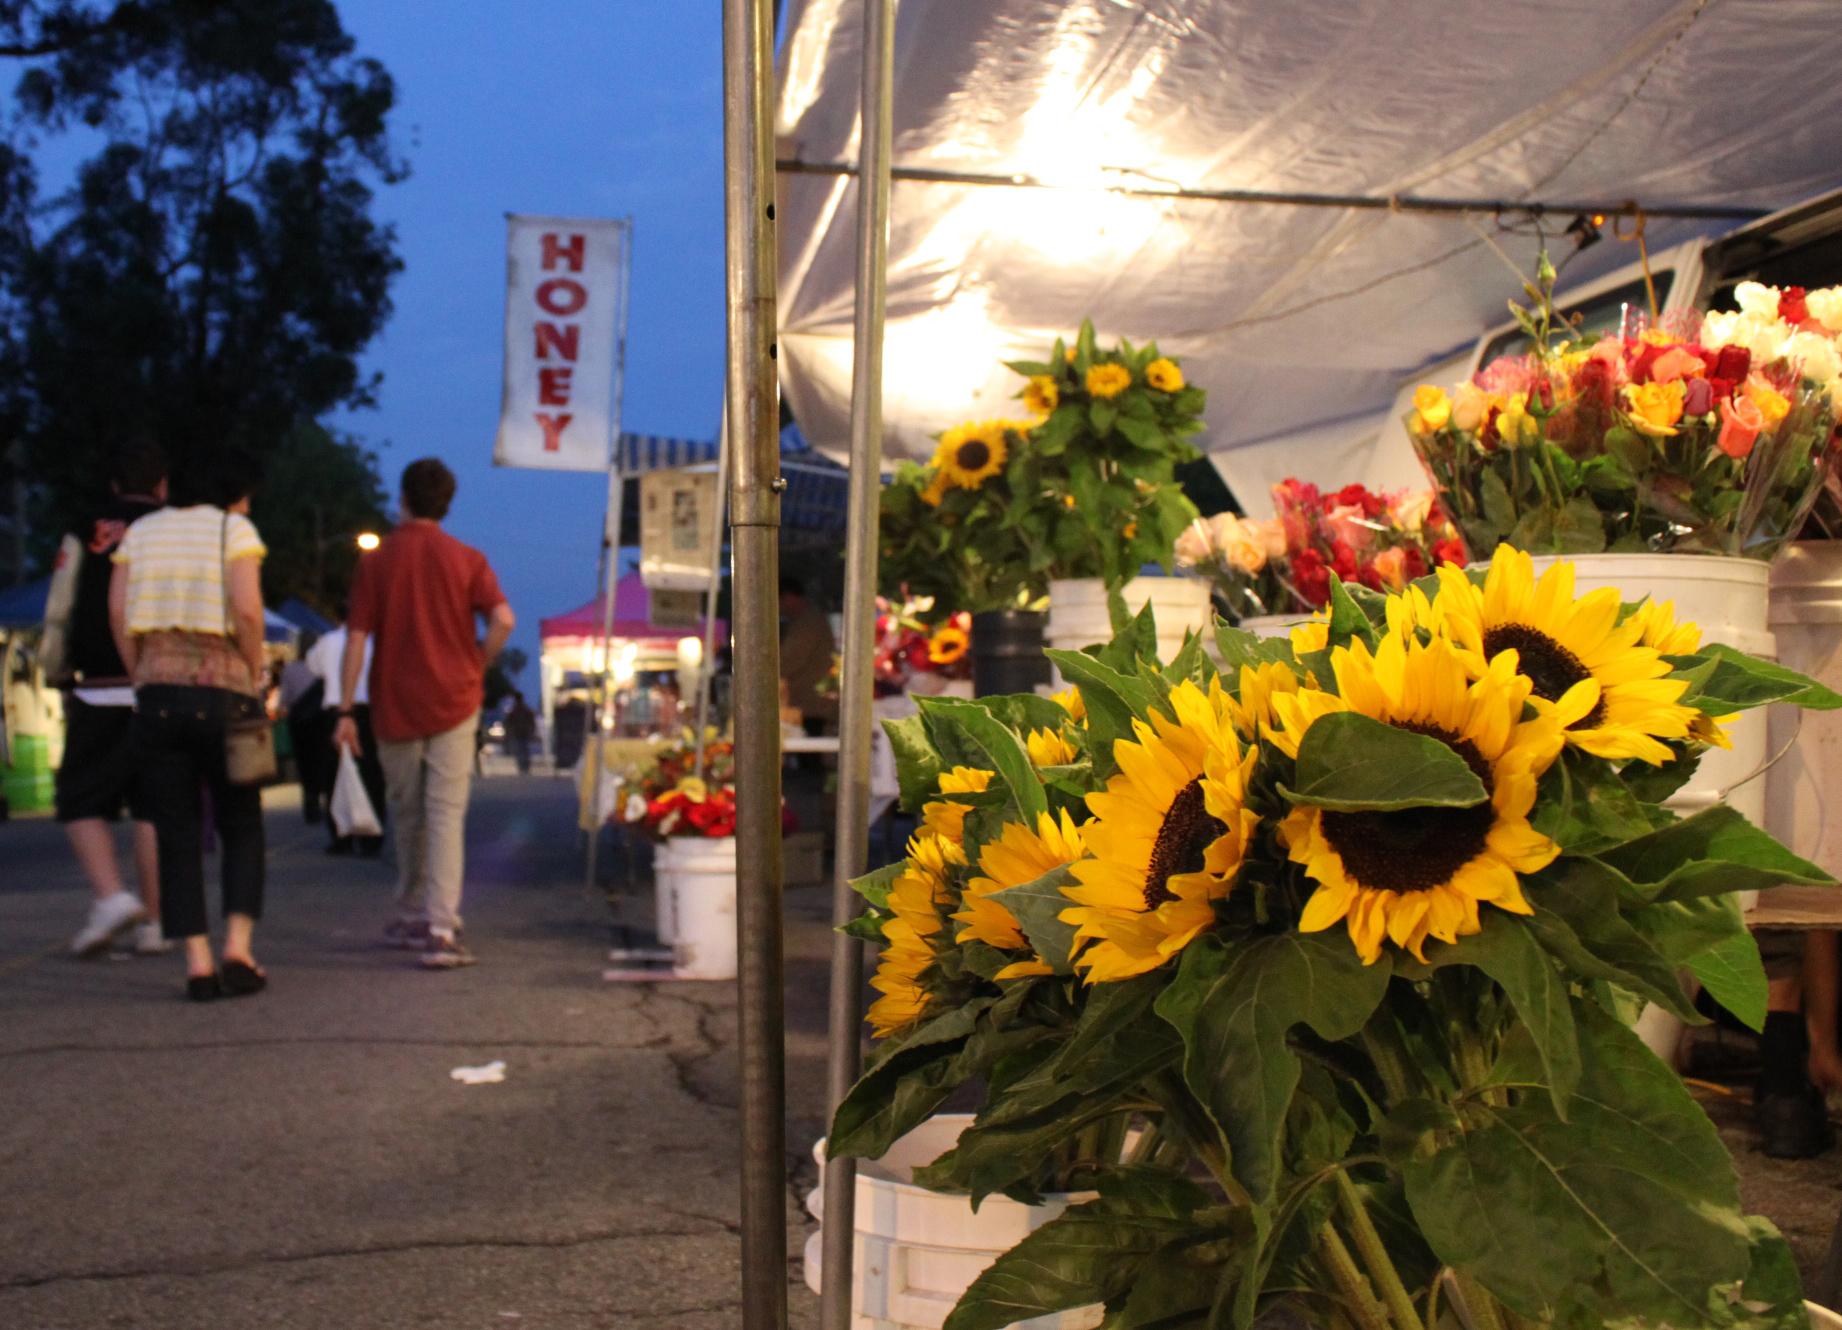 South Pasadena Farmer's Market